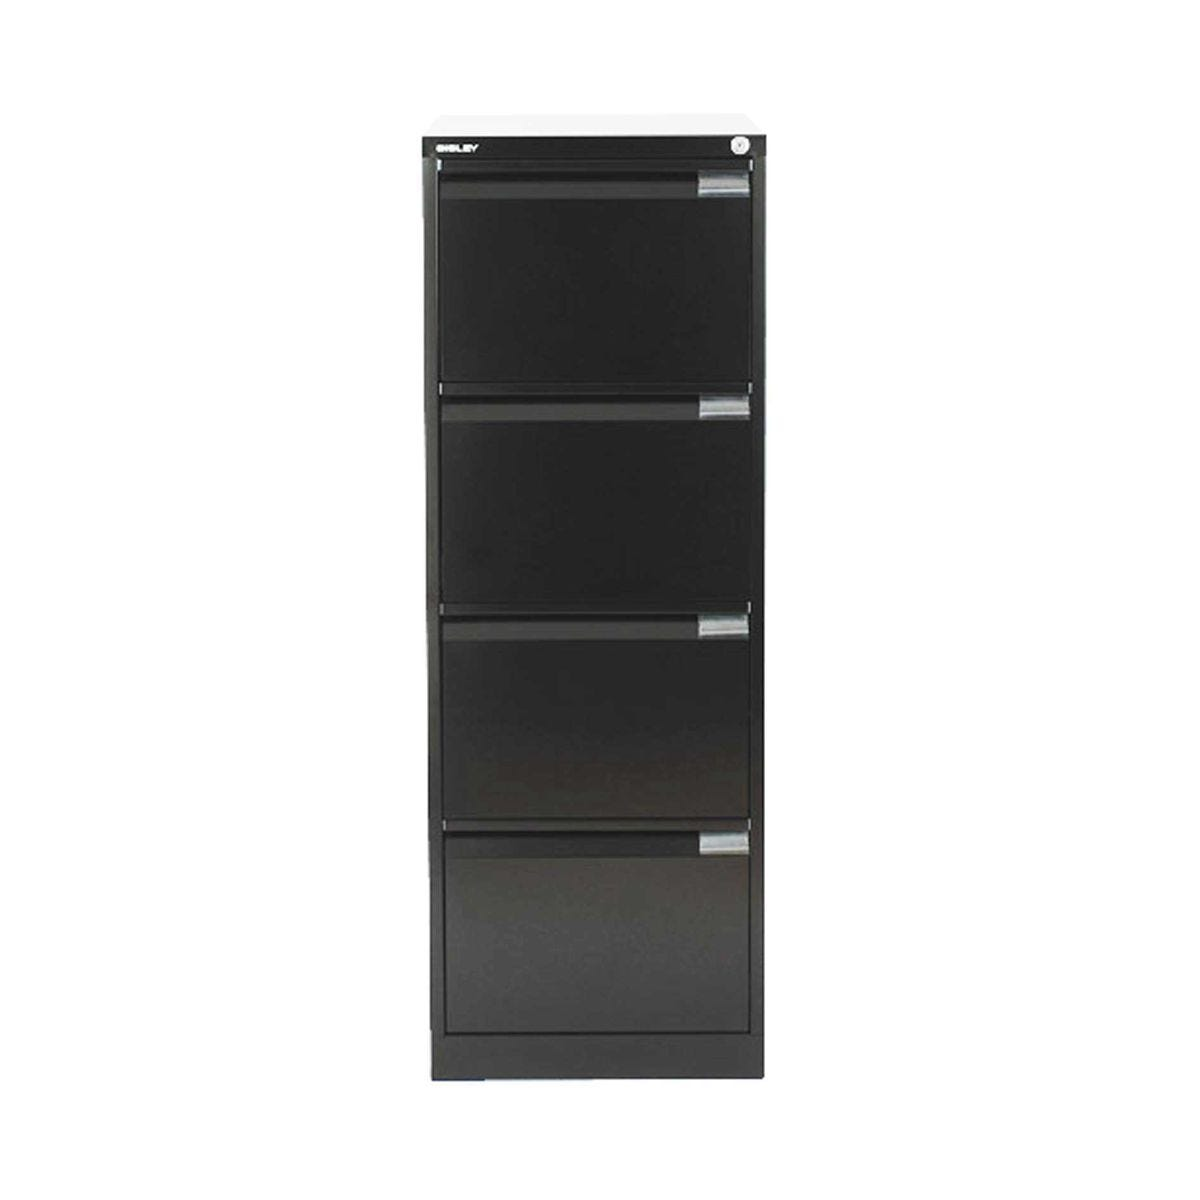 Bisley Filing Cabinet BS4E 4 drawer H1321xW470xD622mm Steel, Black